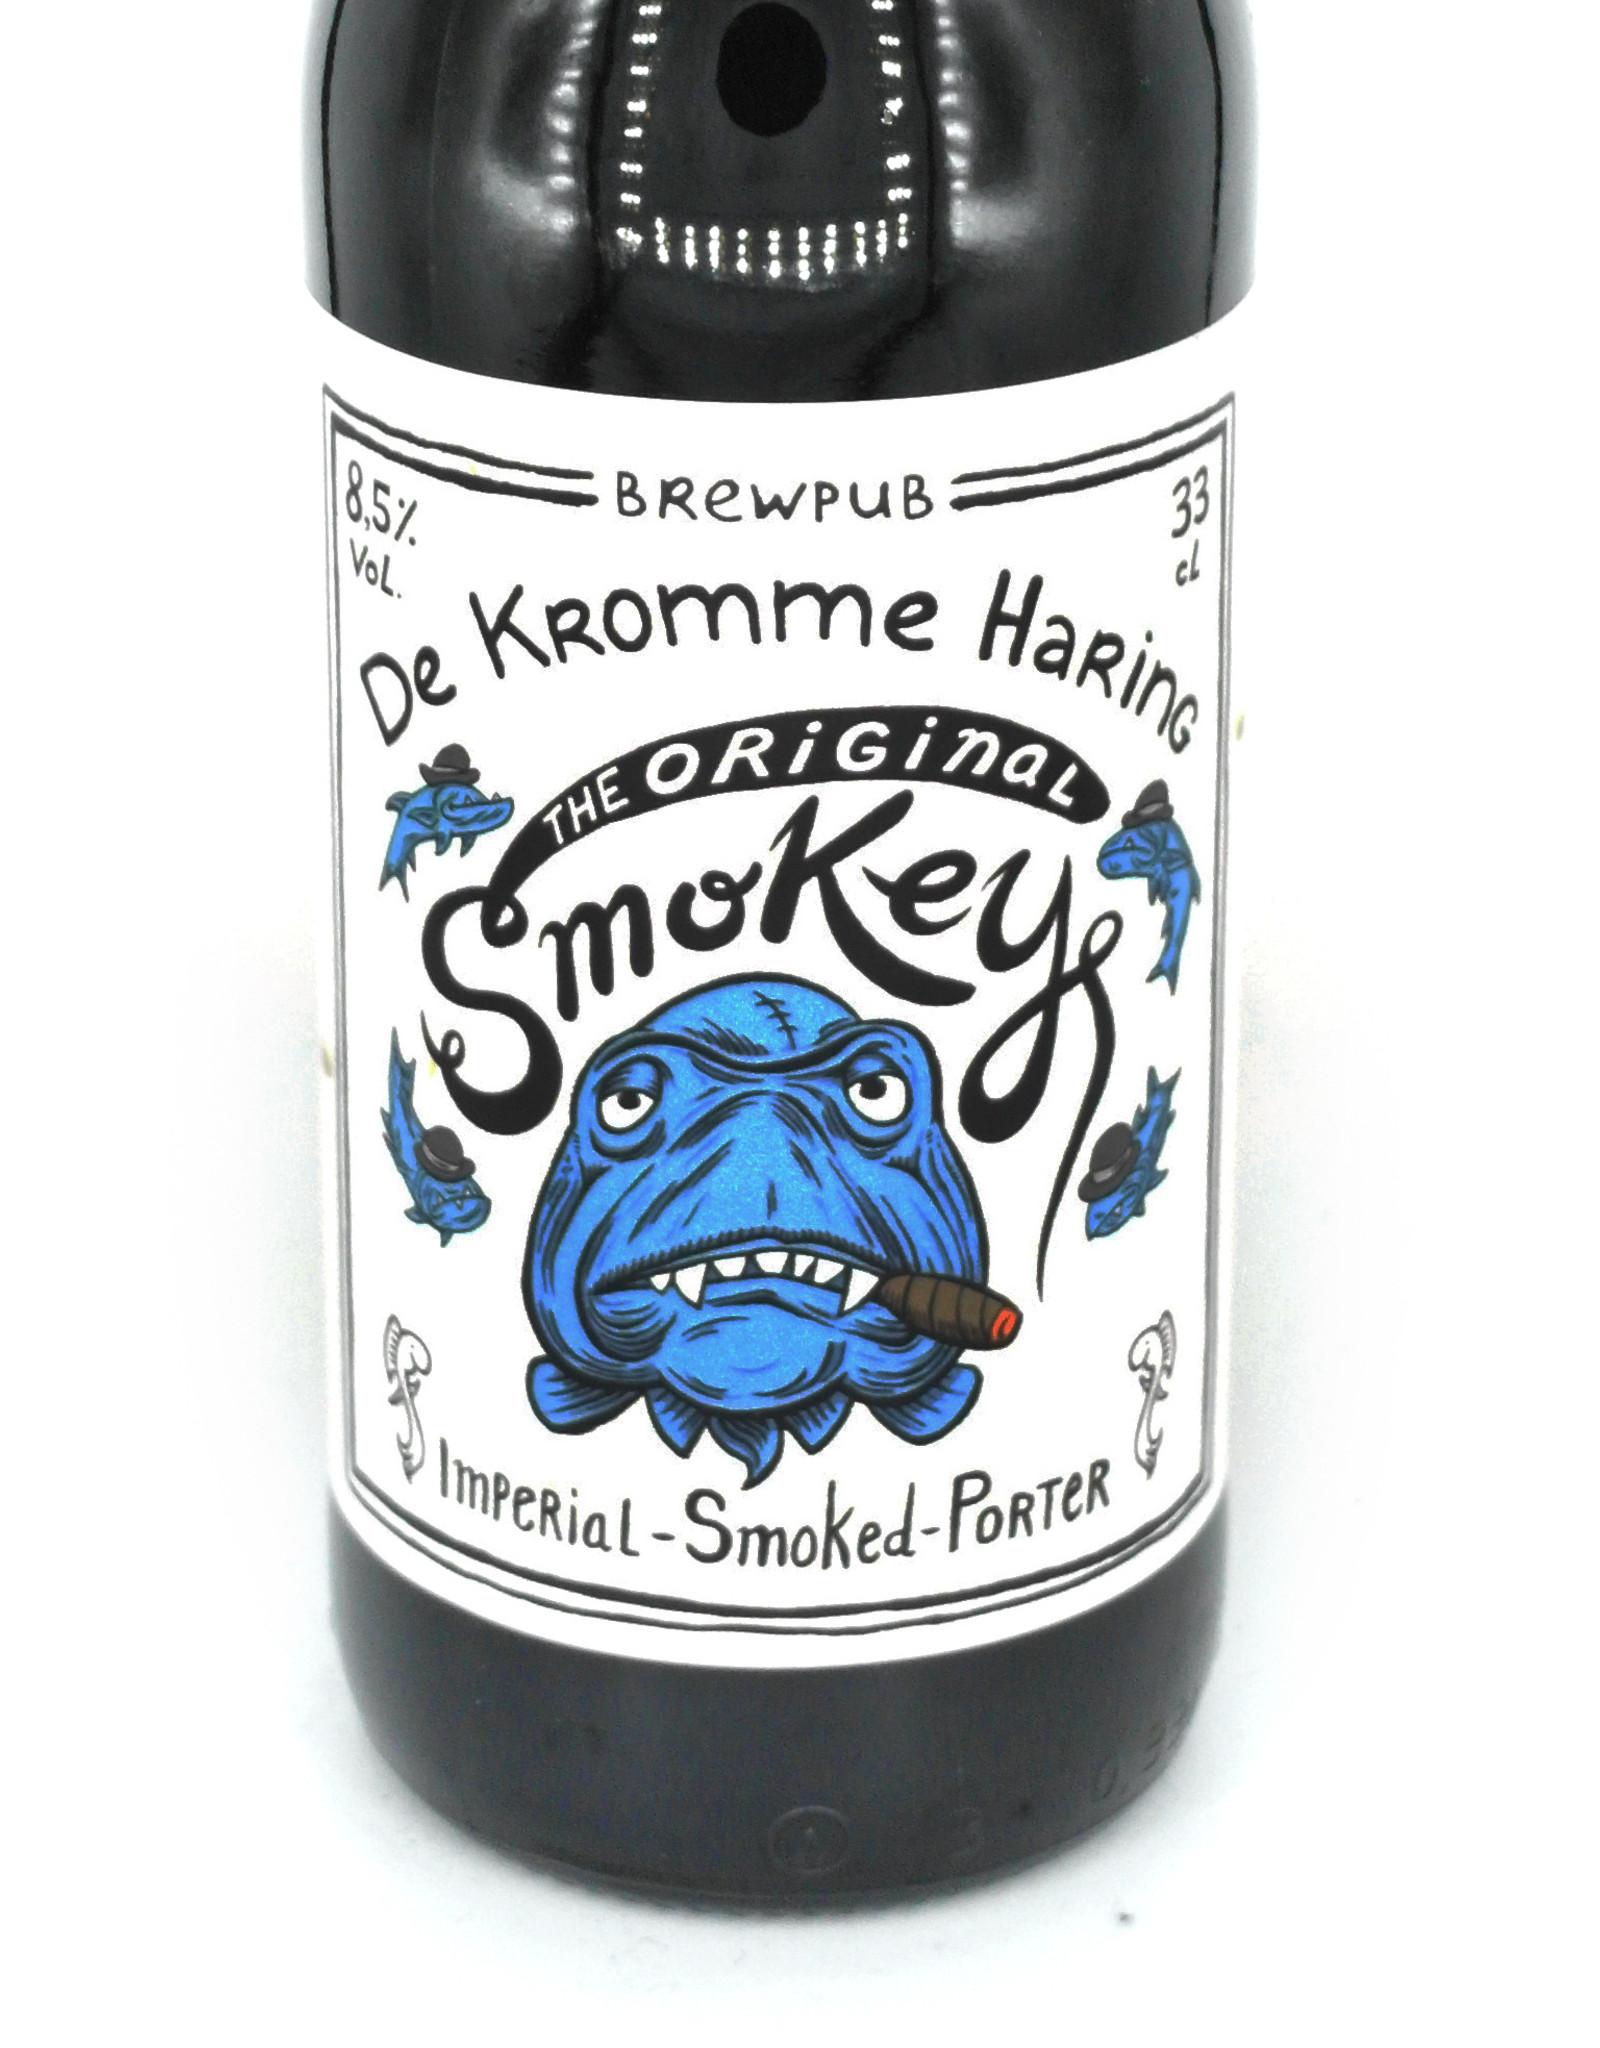 kromme haring Kromme Haring: Original Smokey